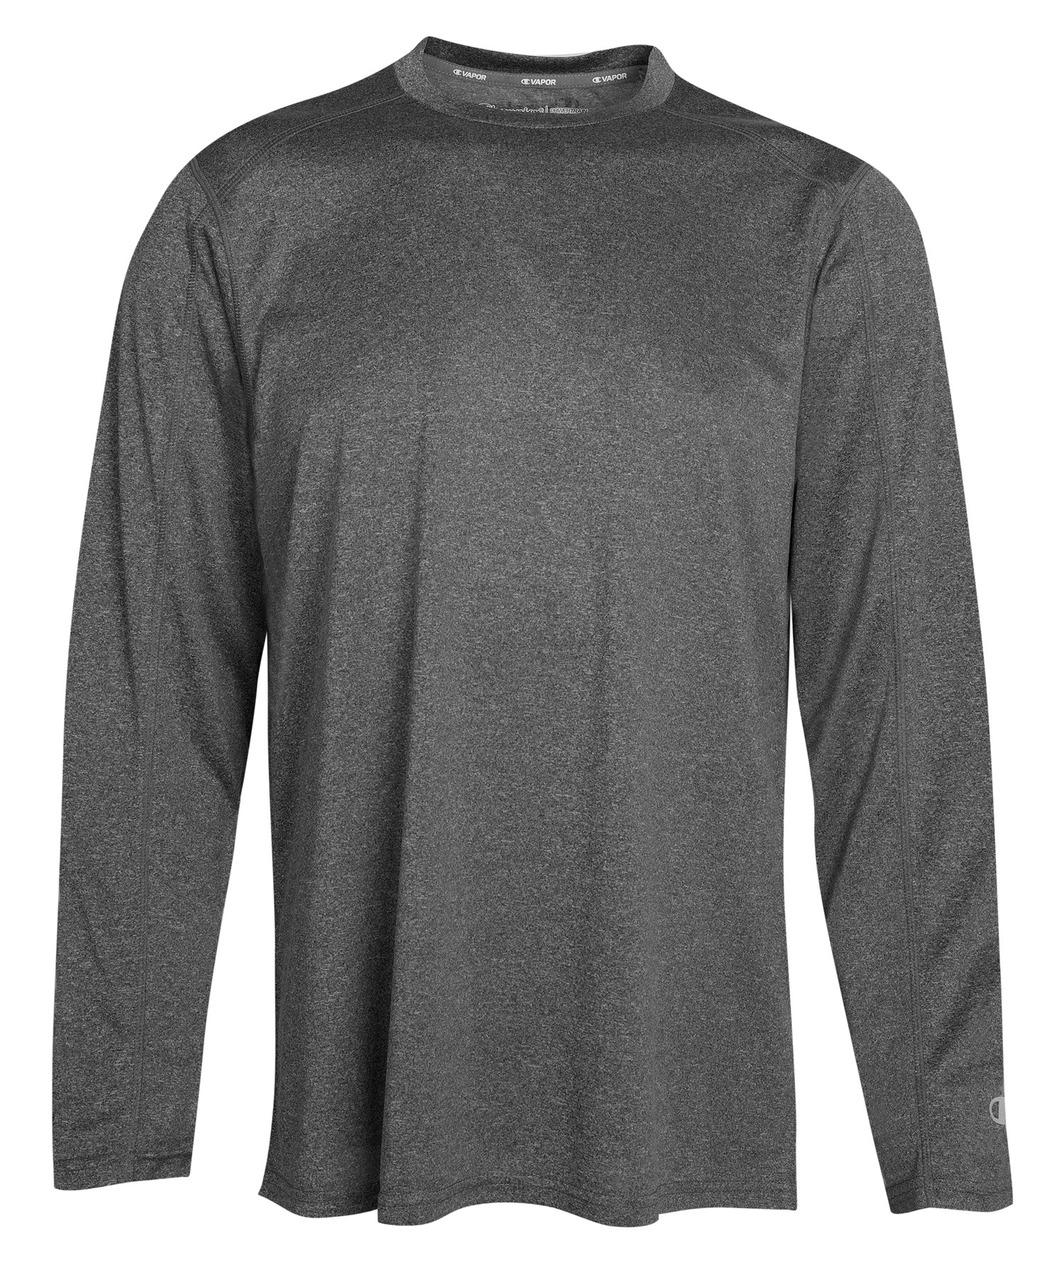 Champion CV26 Vapor Heathered Performance Long Sleeve | Athleticwear.ca